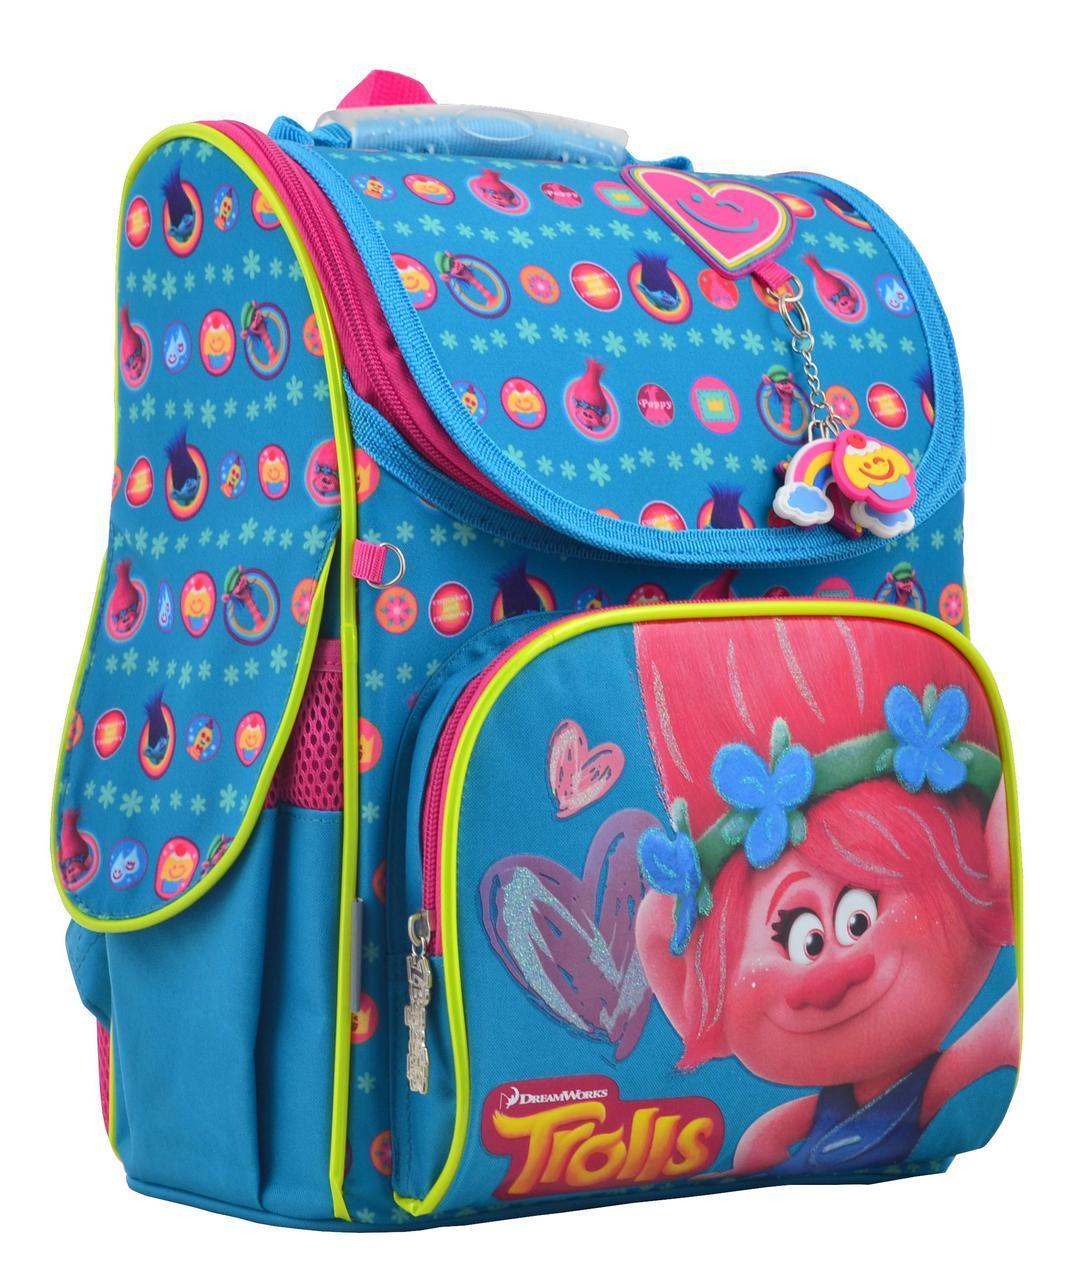 Рюкзак 1Вересня 555162 каркасный H-11 Trolls turquoise